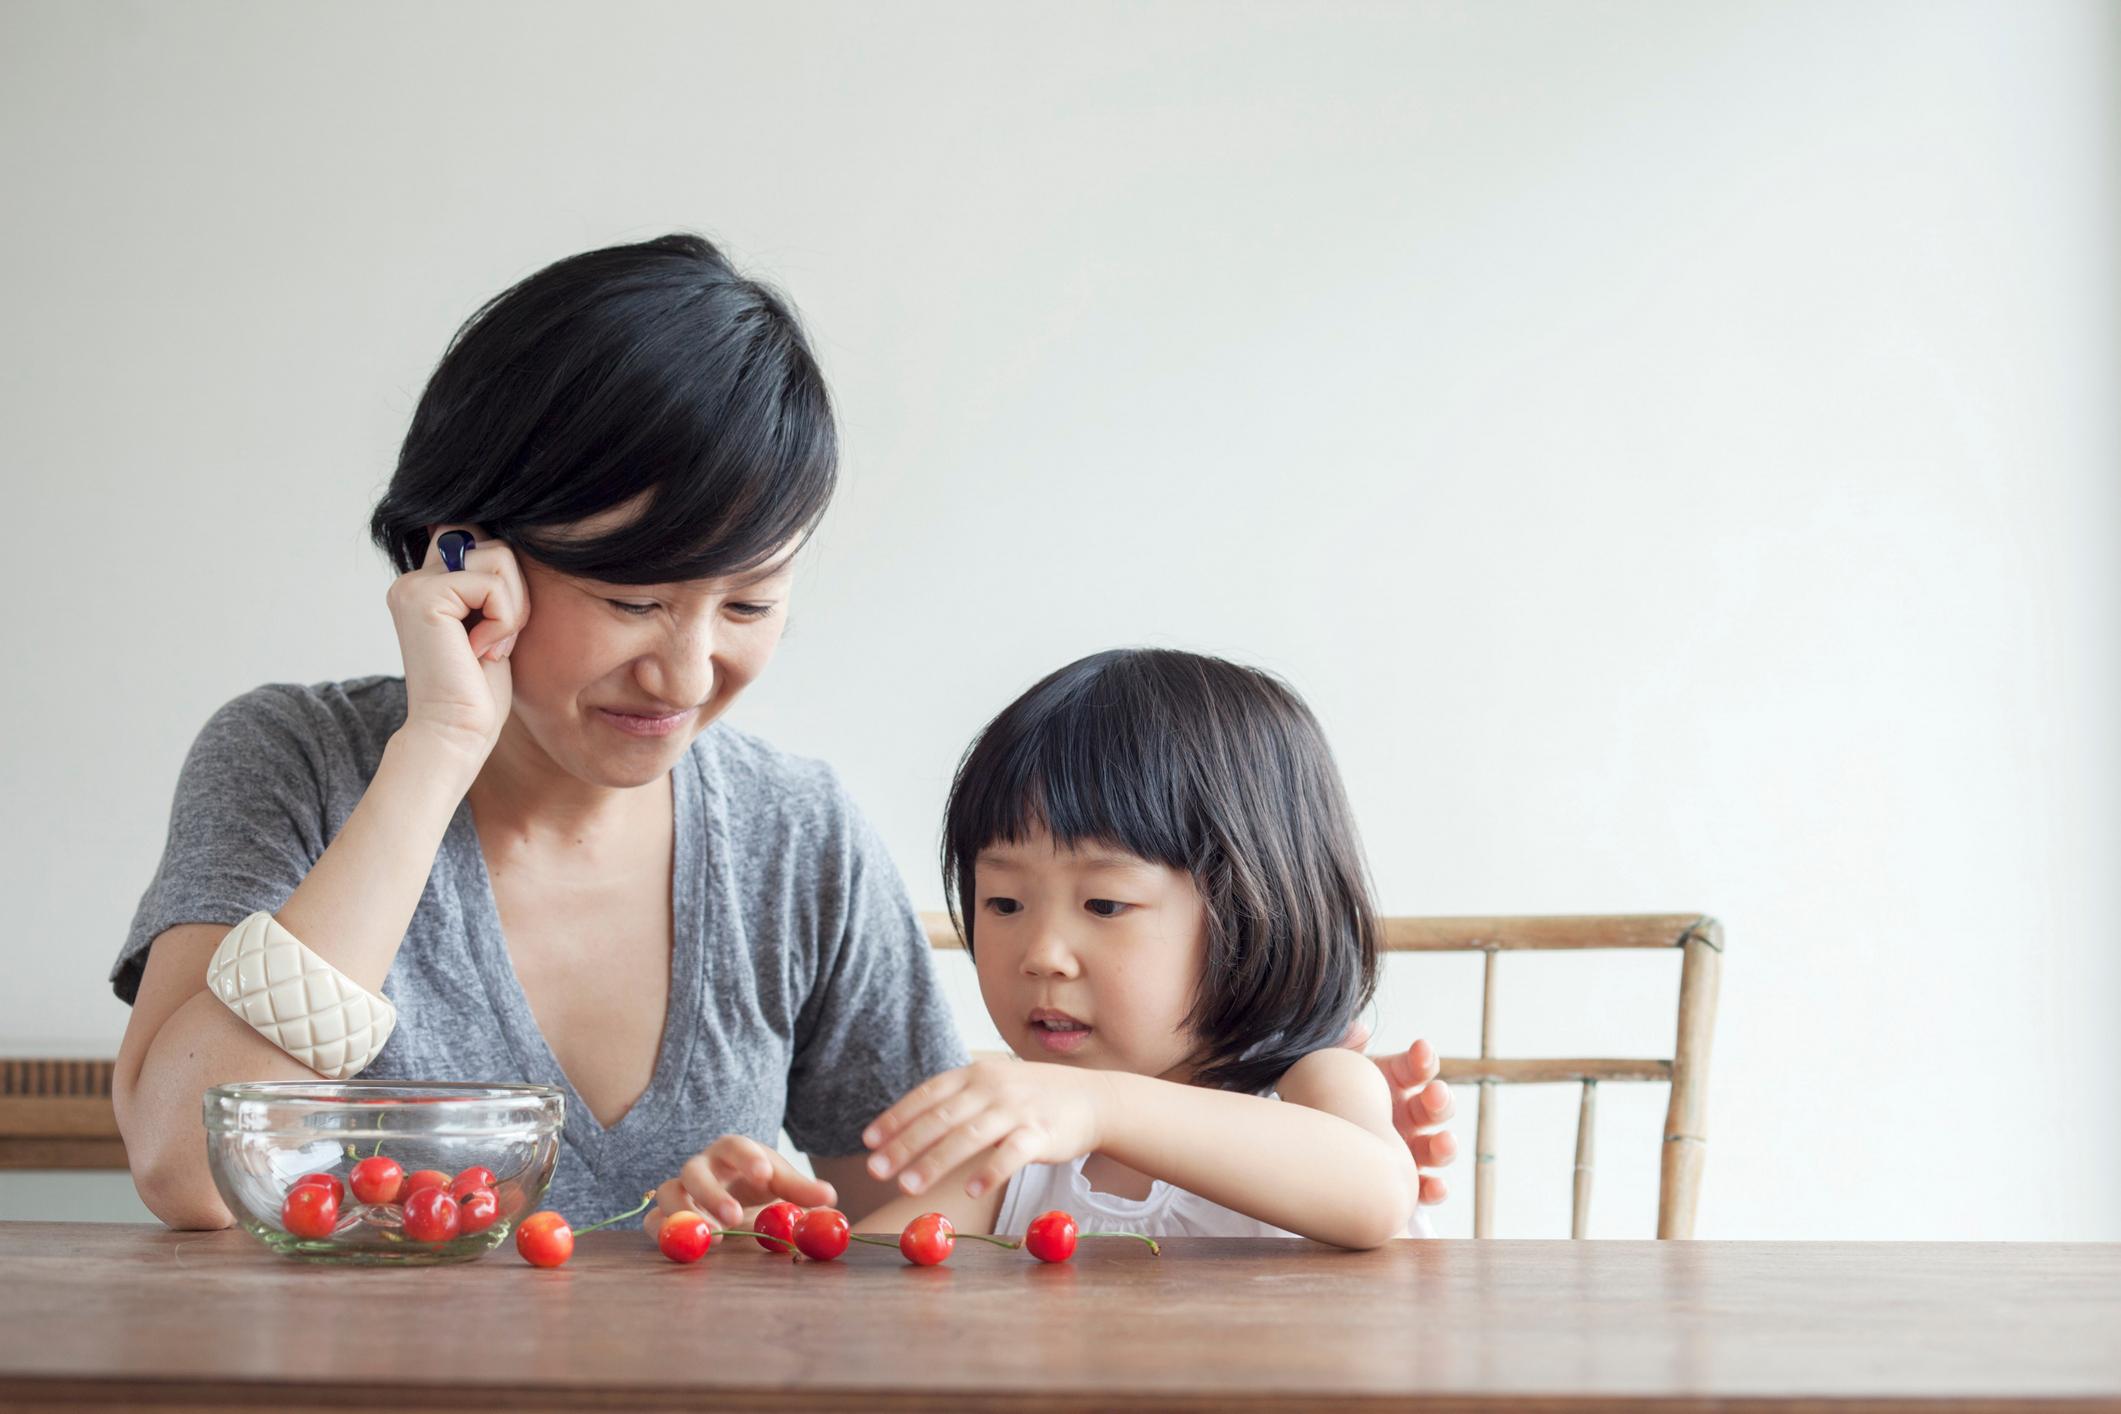 Seorang ibu sedang mengajarkan angka bahasa Inggris pada anaknya - Edu2Review